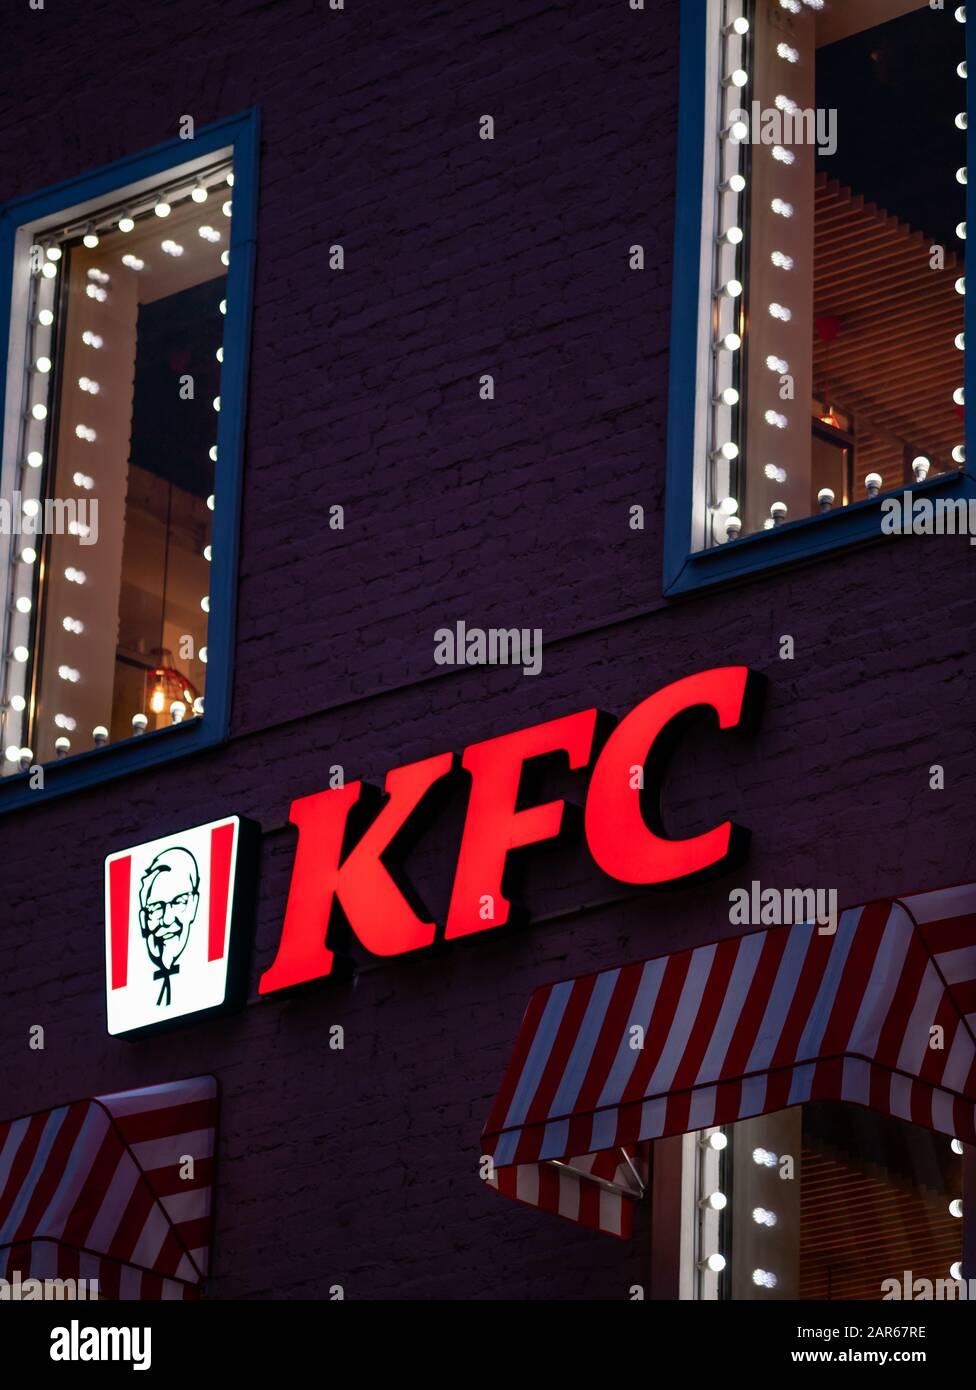 Kfc Logo High Resolution Stock Photography and Images - Alamy